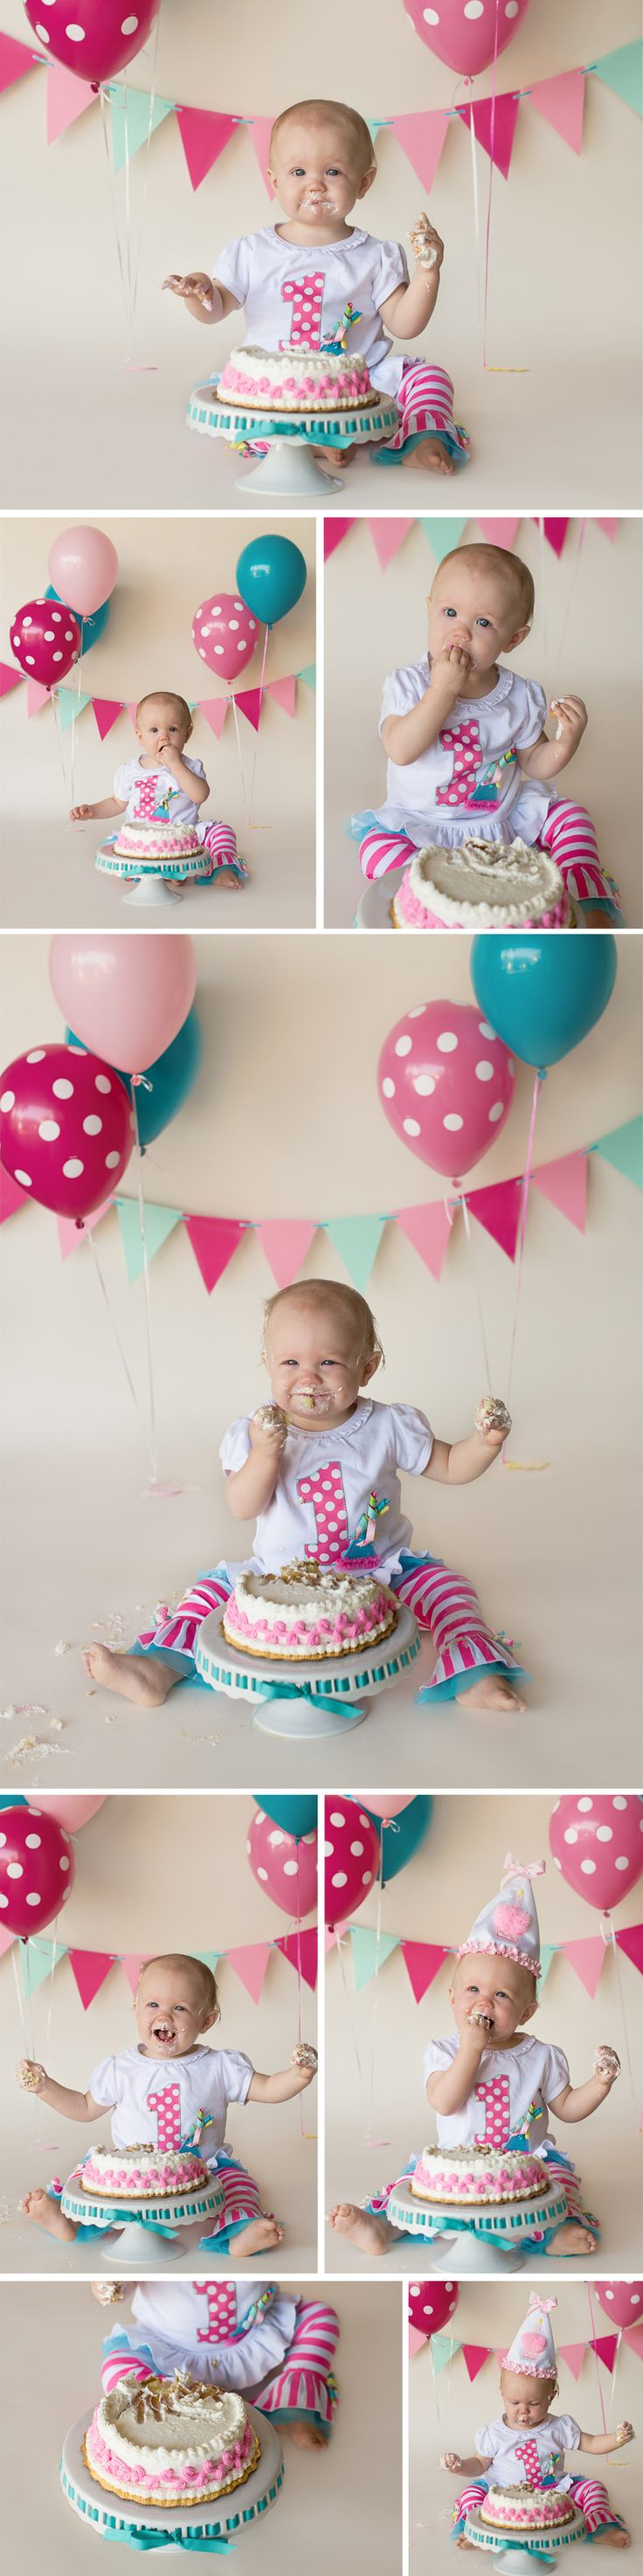 Tampa Family Photographer Sherri Kelly - Baby Girl First Birthday Cake Smash Photo Session